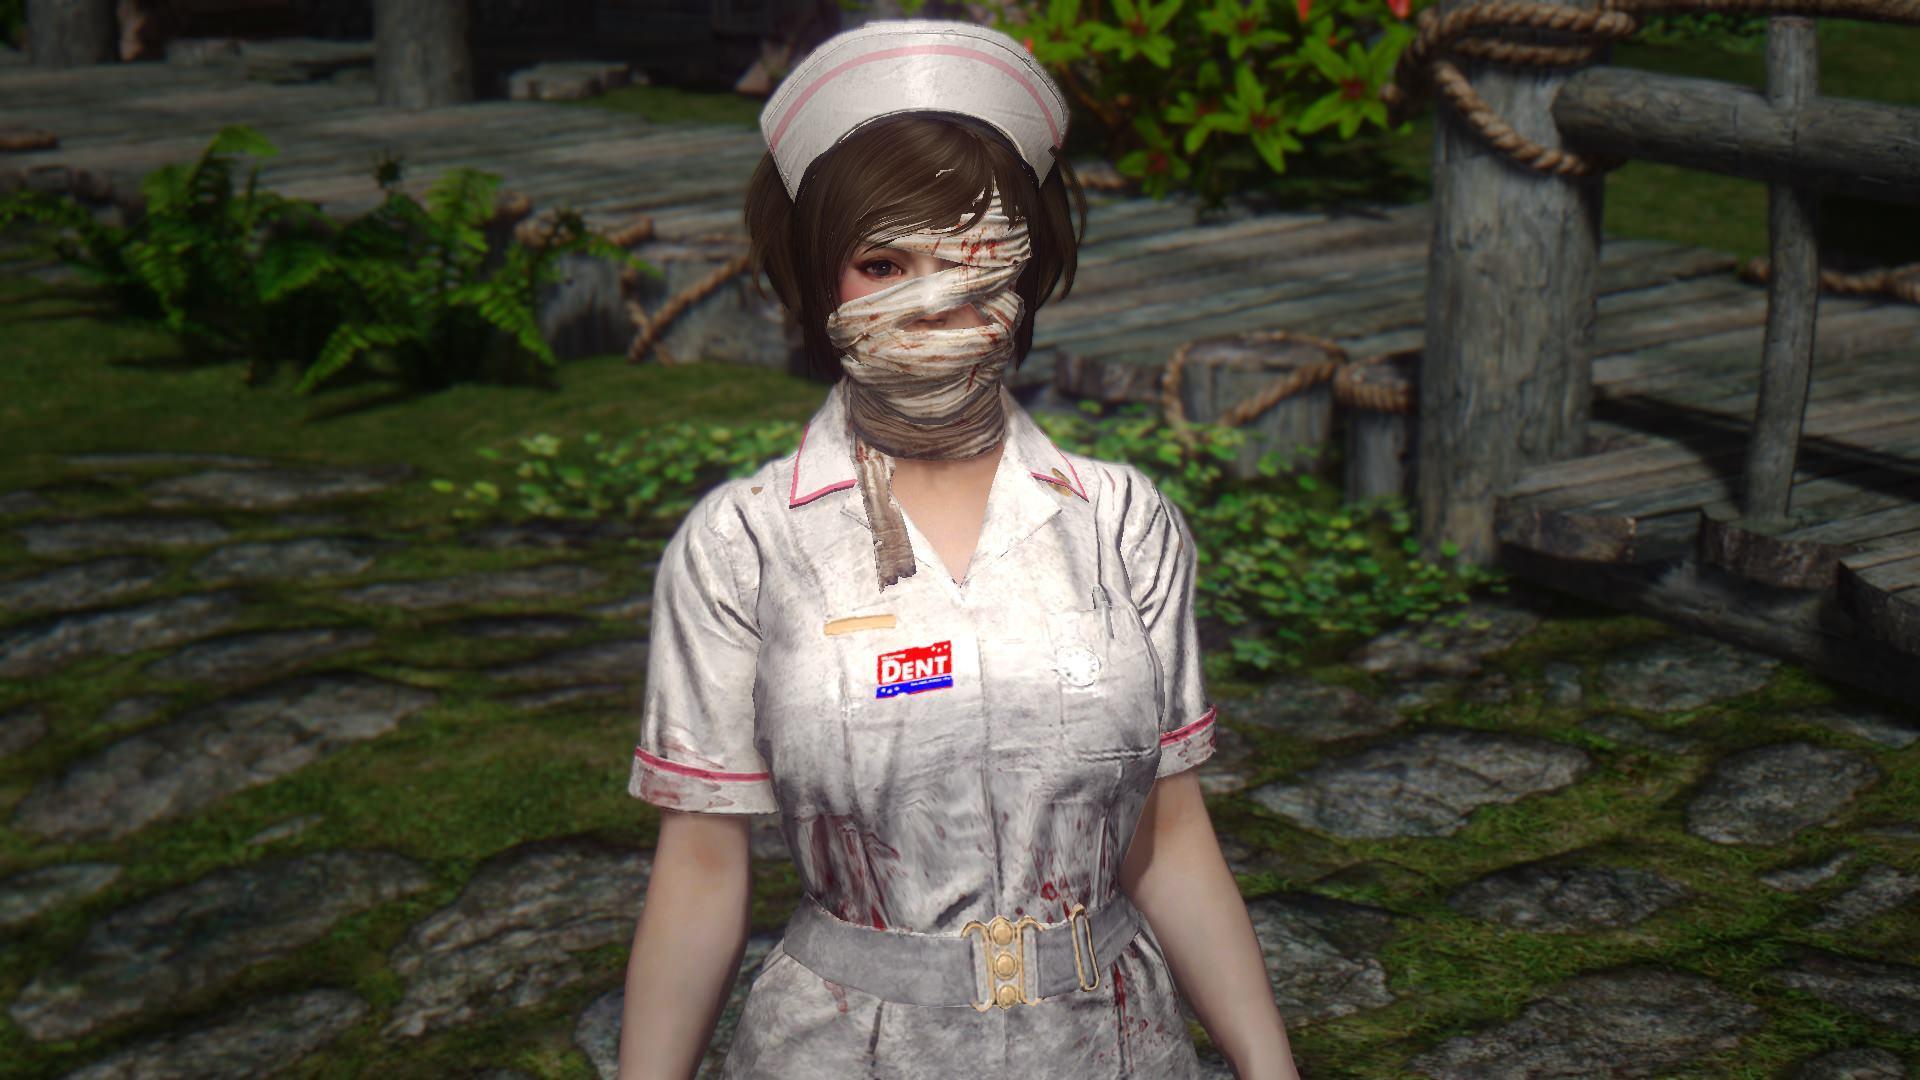 PUBG_Bloody_Nurse_UNPB_1.jpg